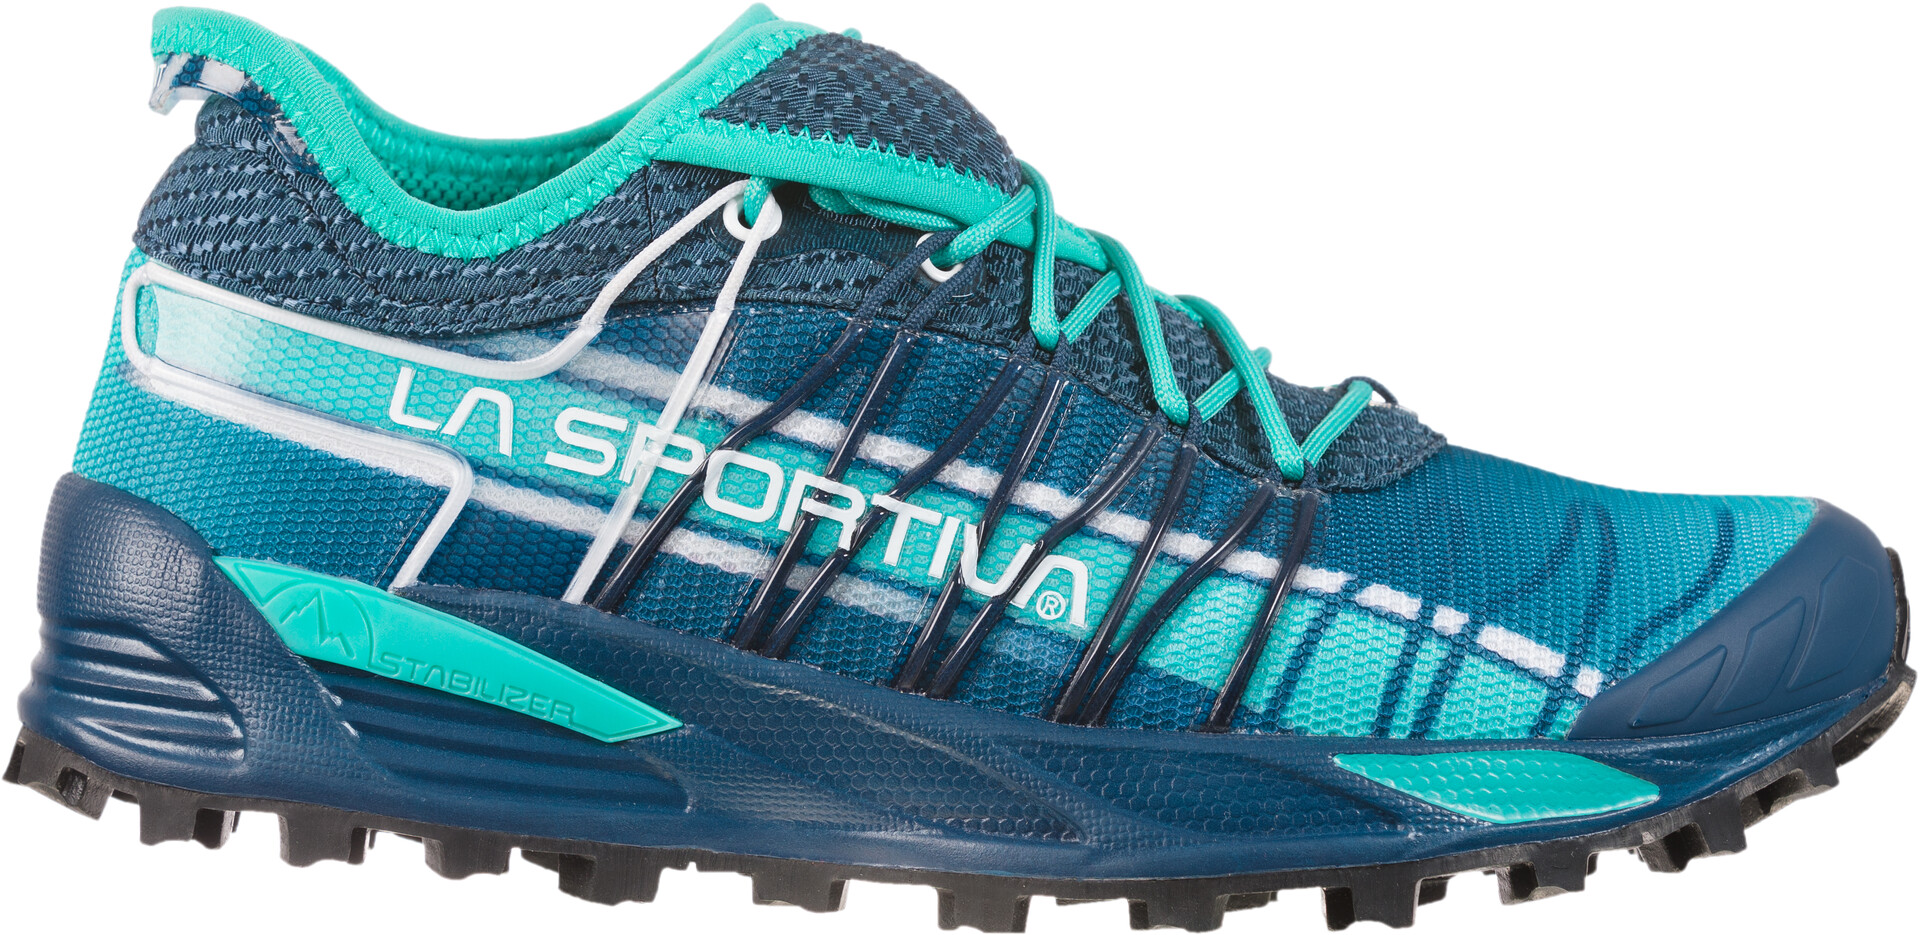 La Sportiva Mutant Chaussures de trail Femme, opalaqua